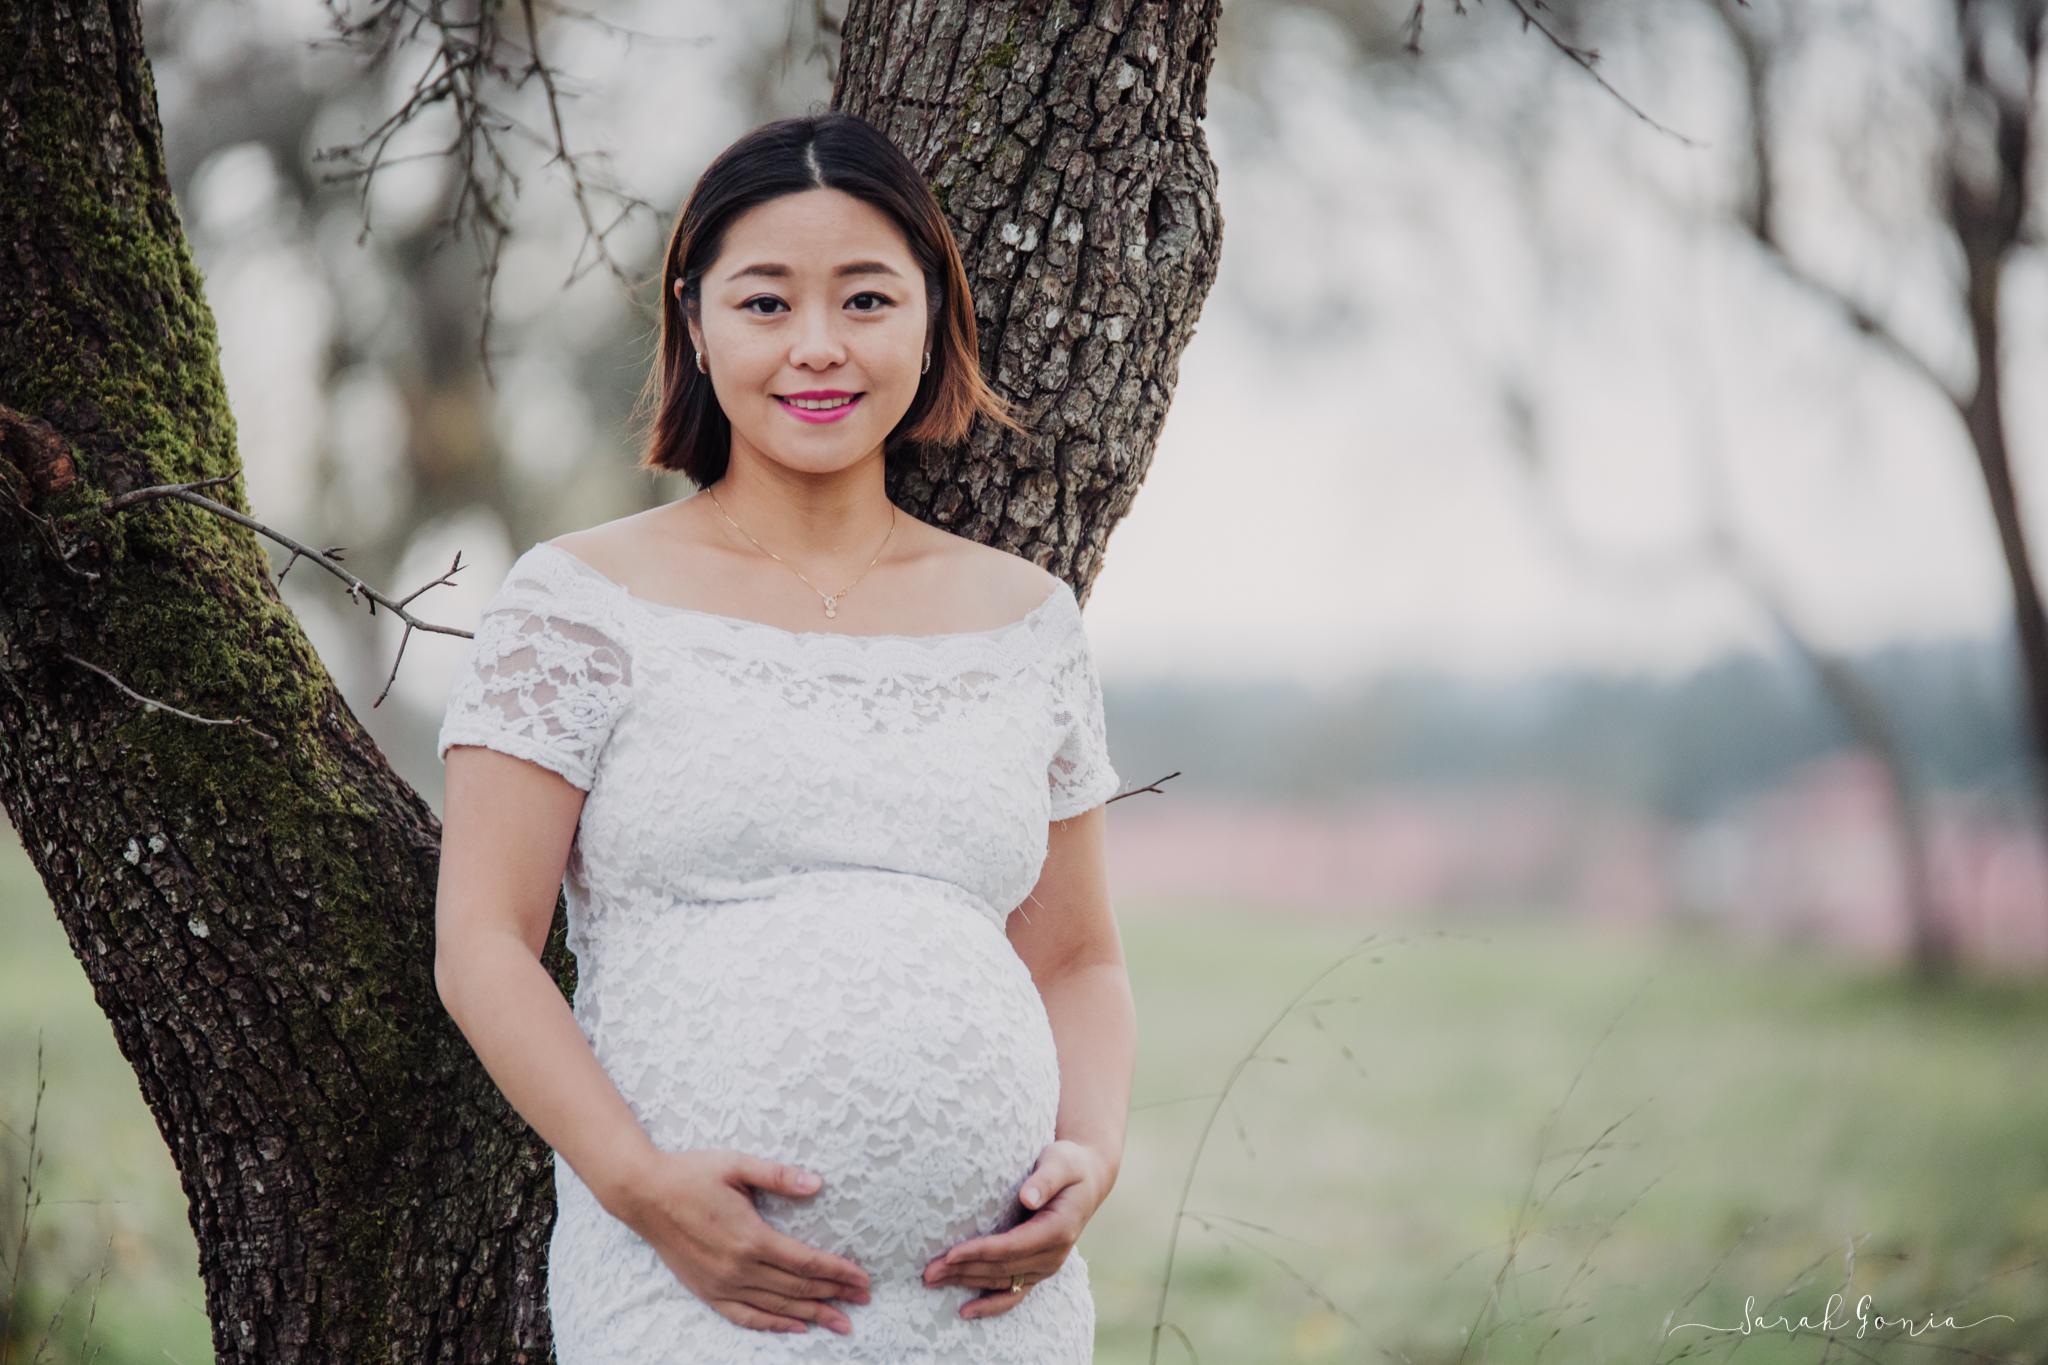 Olympia Tacoma Seattle Maternity Photography